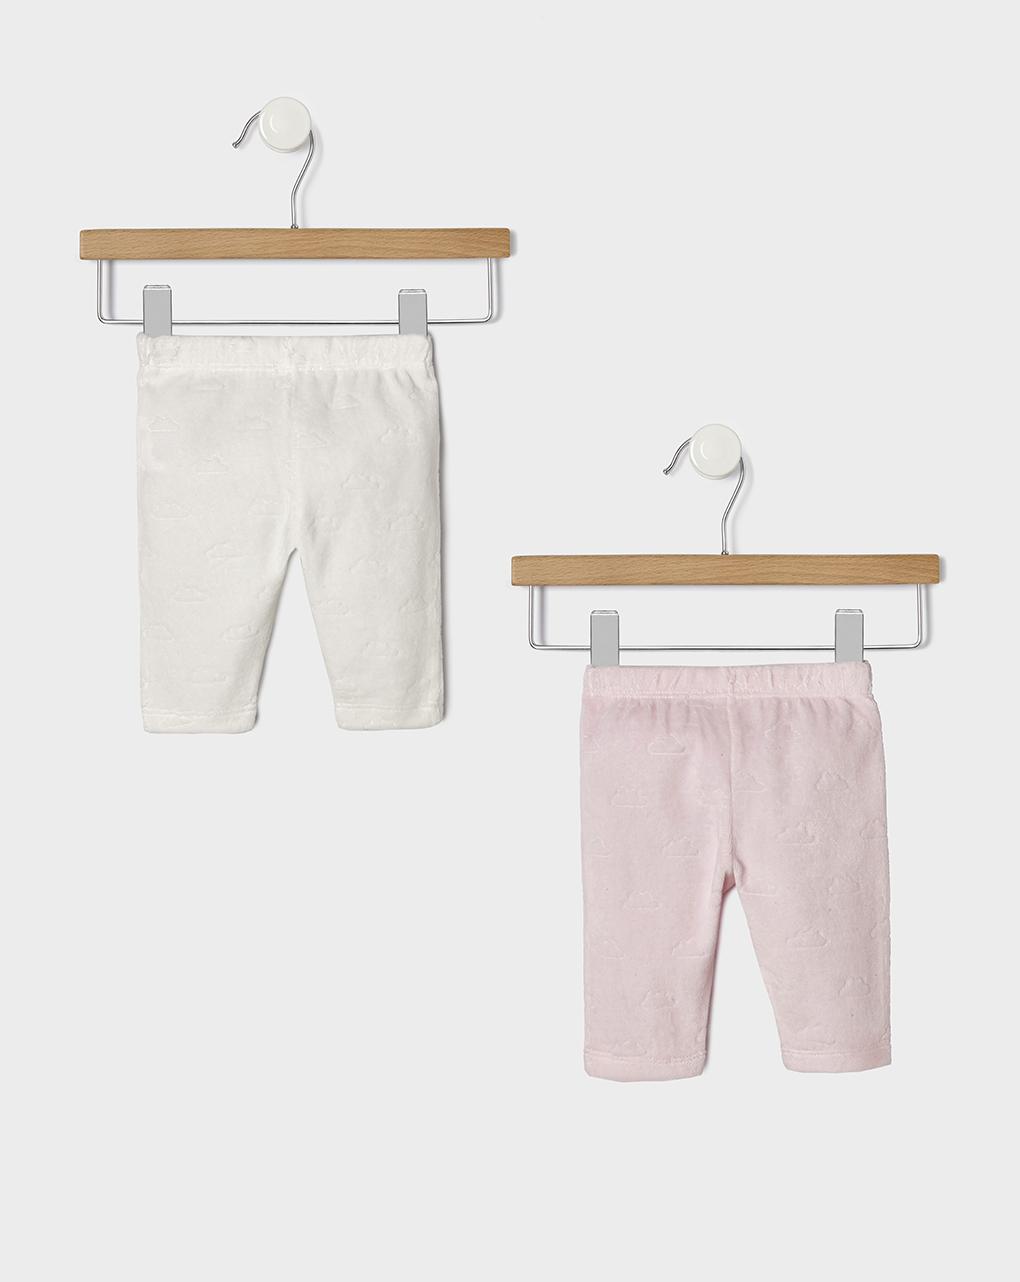 Pack 2 ghette in ciniglia operata nuvola bianco e rosa - Prénatal